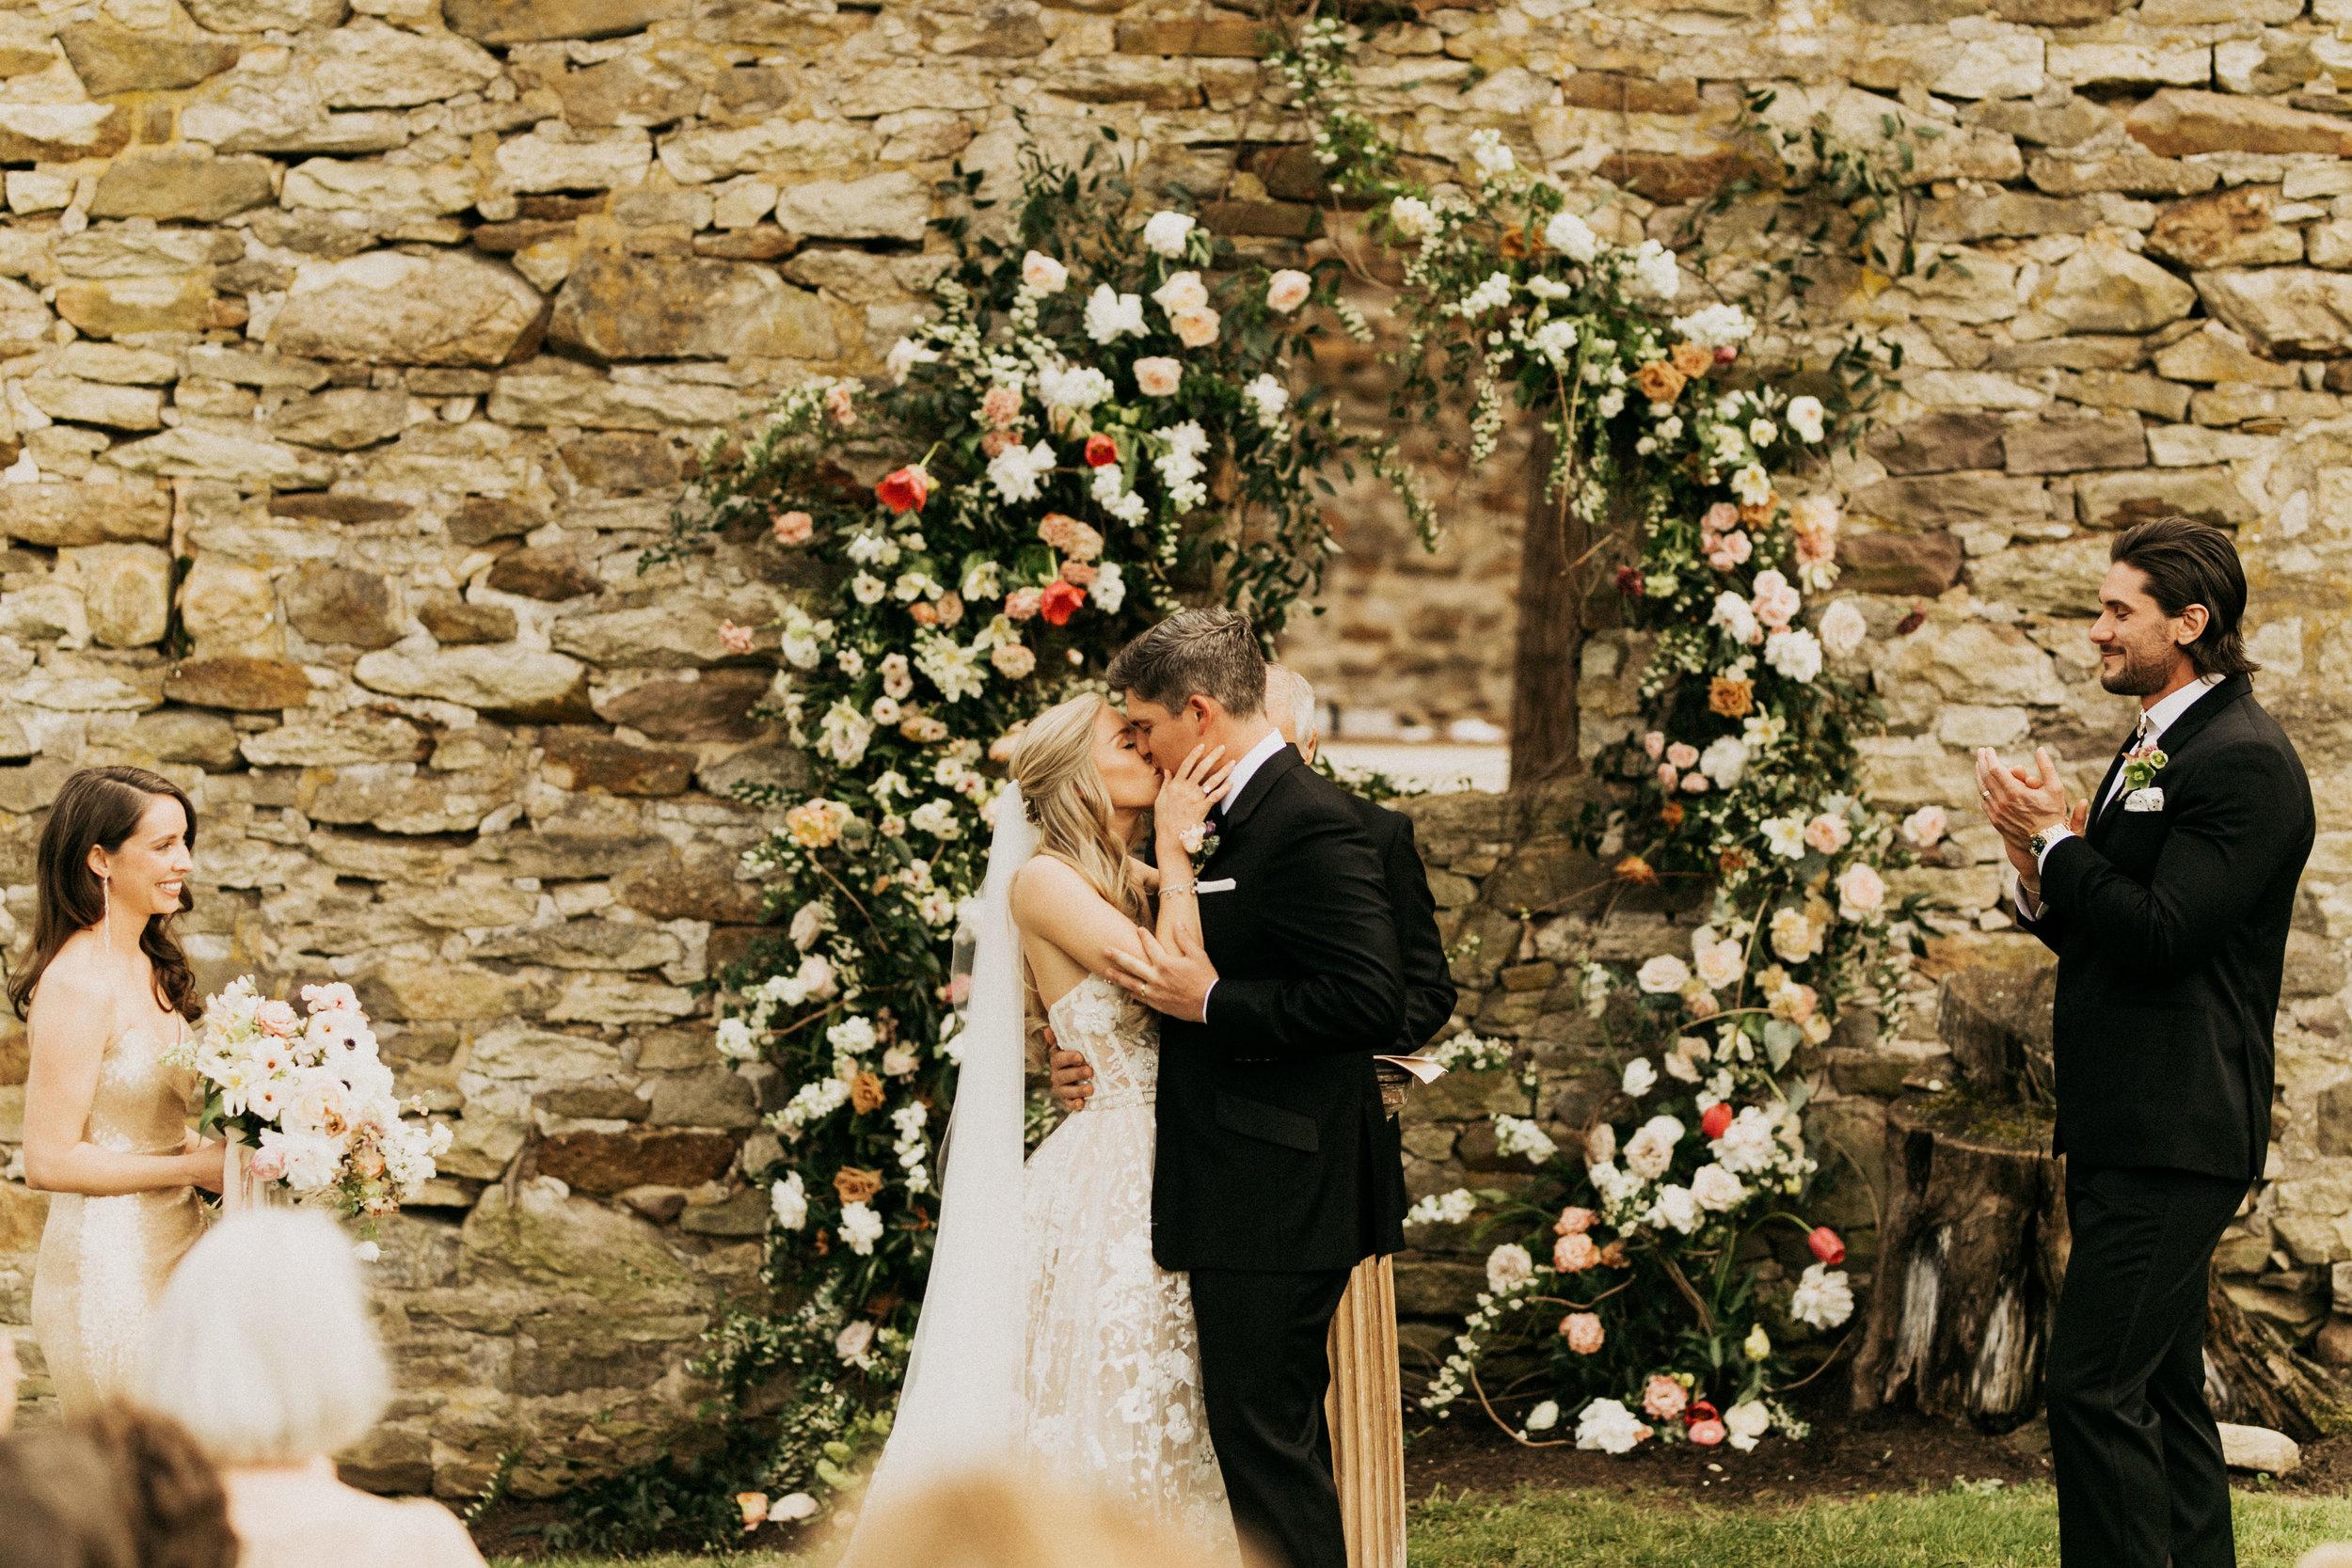 Hannah_Ryan_Wedding_IndiaEarl_914.jpg